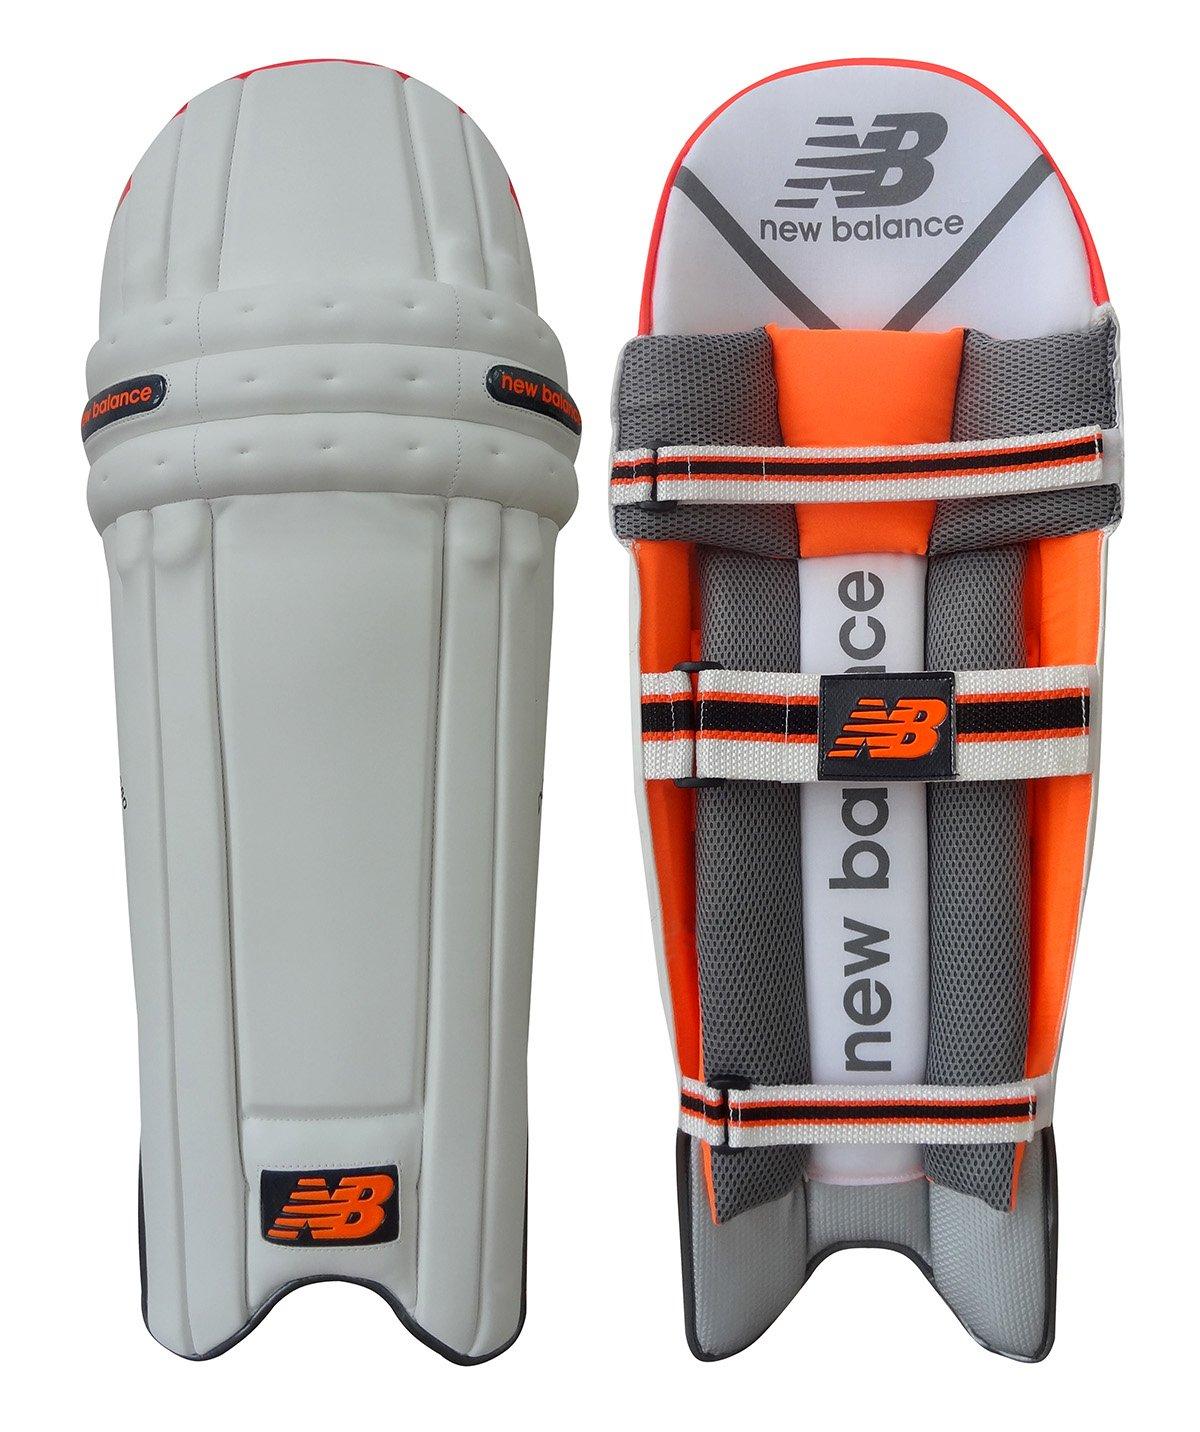 new balance dc 580 batting pads